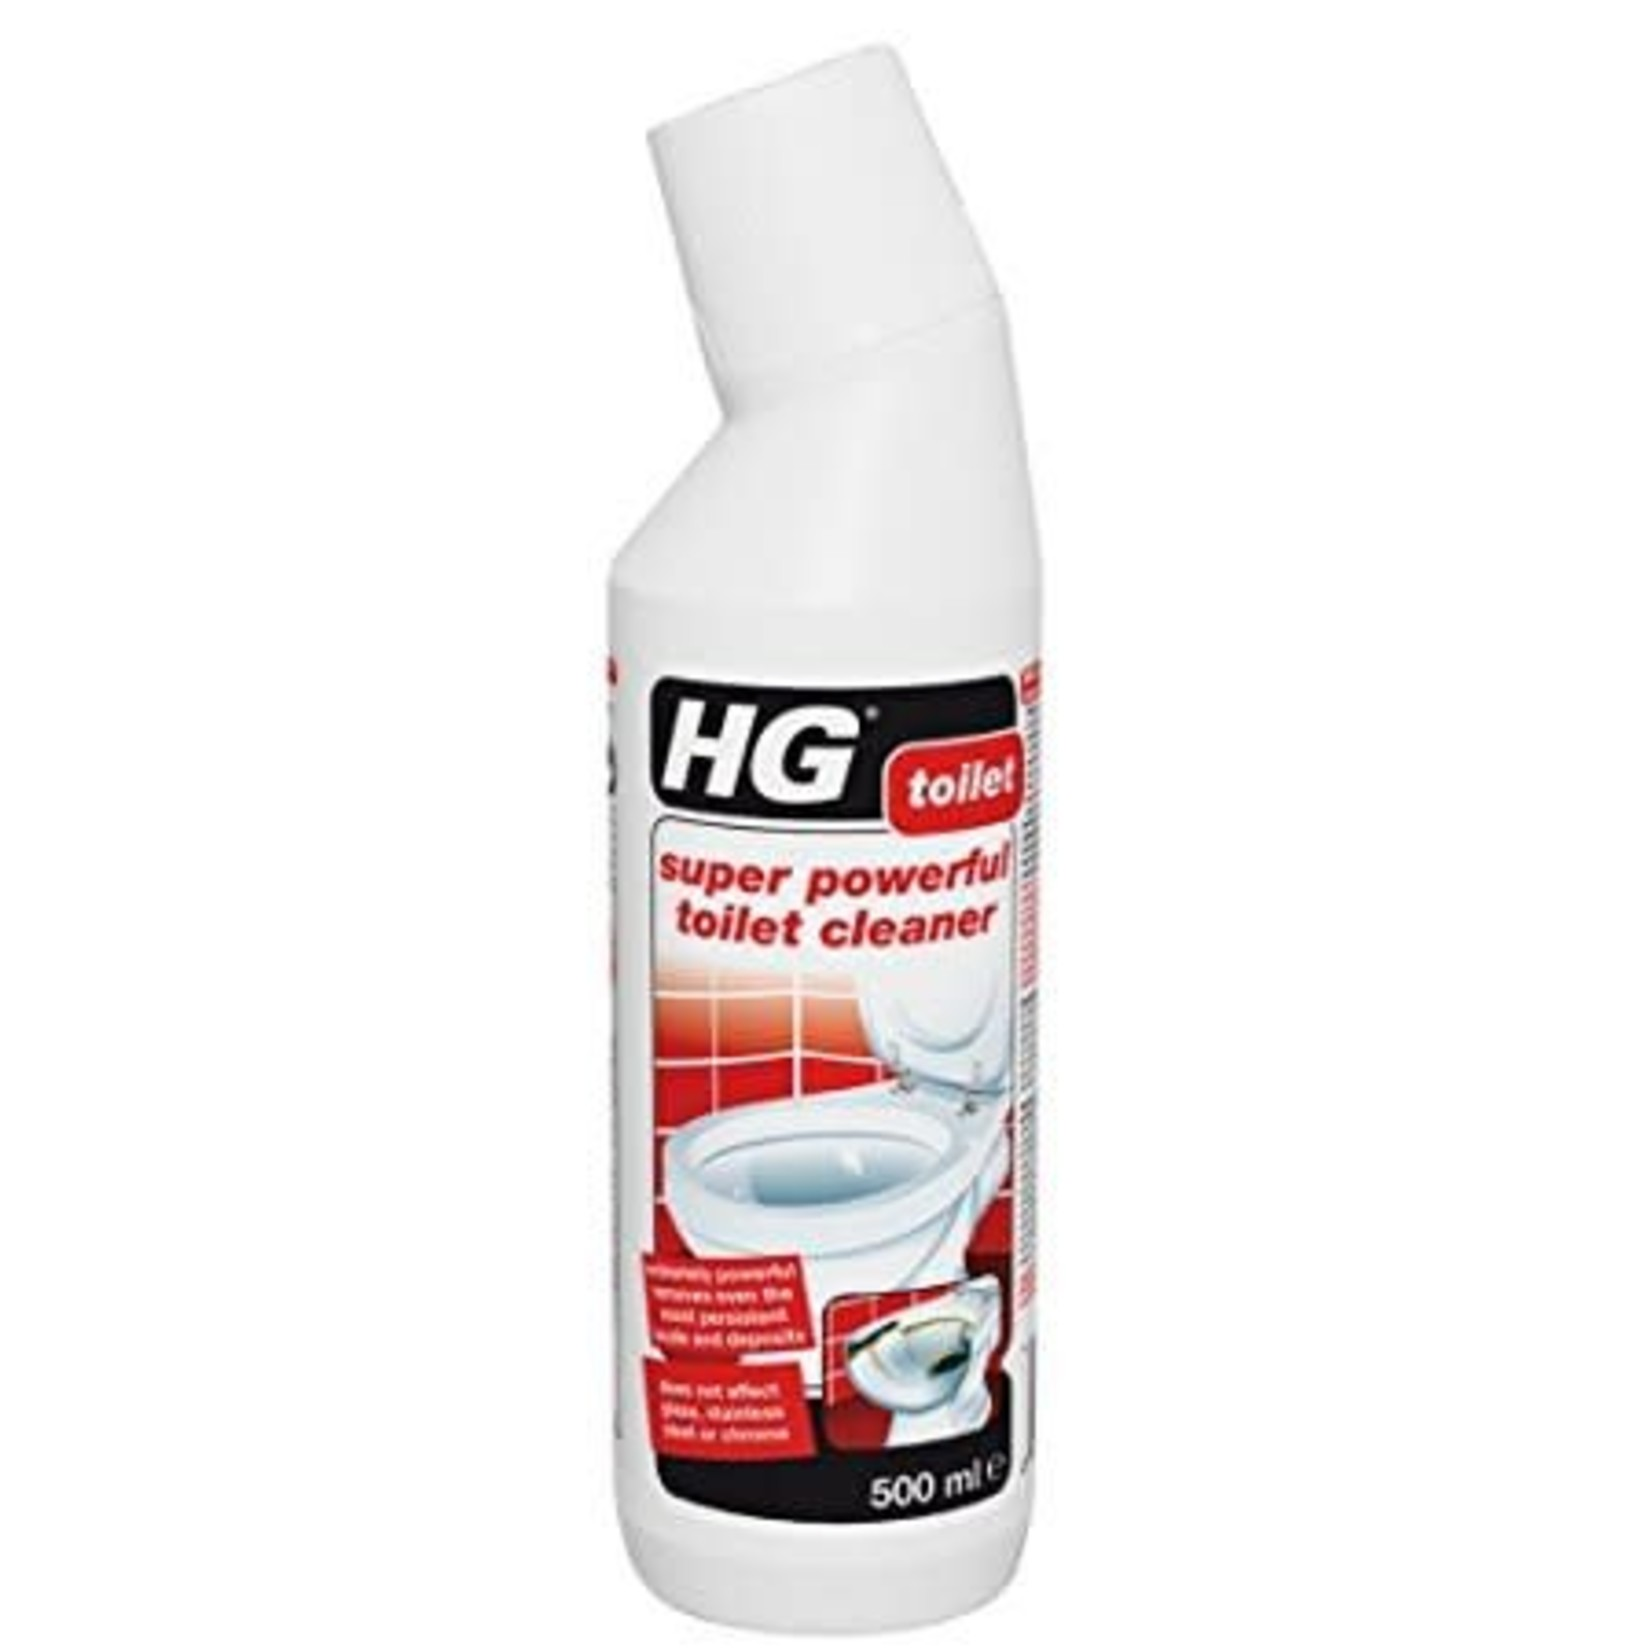 HG HG SUPER POWERFUL TOILET CLEANER 500ML